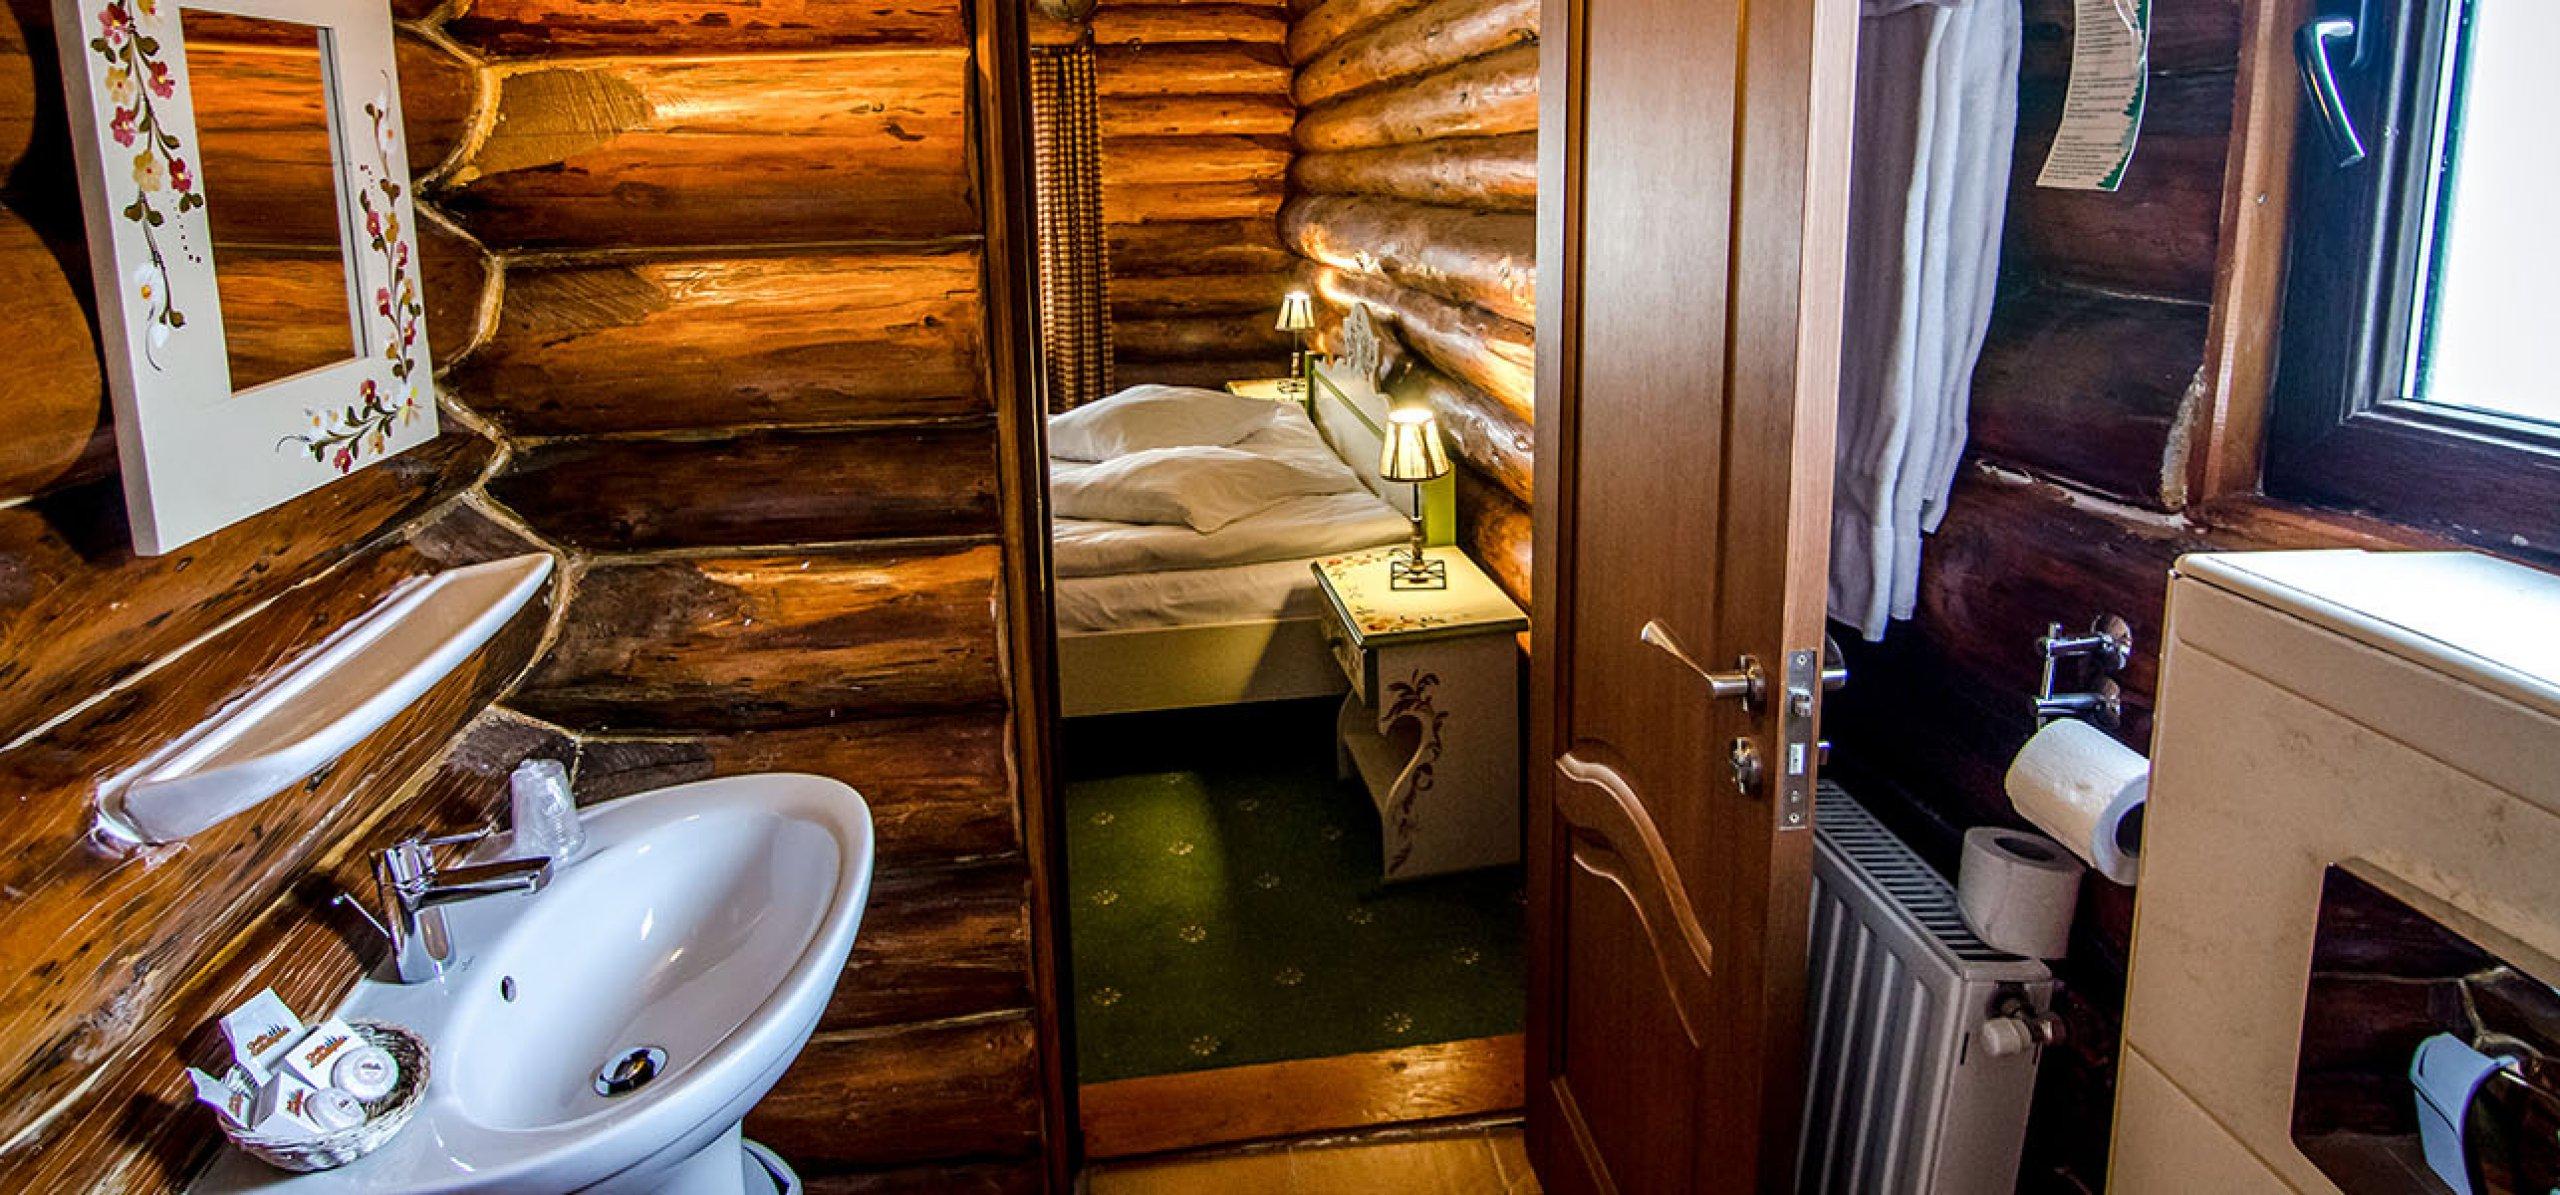 grup-sanitar-rustic-camera-dubla-matrimoniala-vila-frasinul-cheile-gradistei-fundata